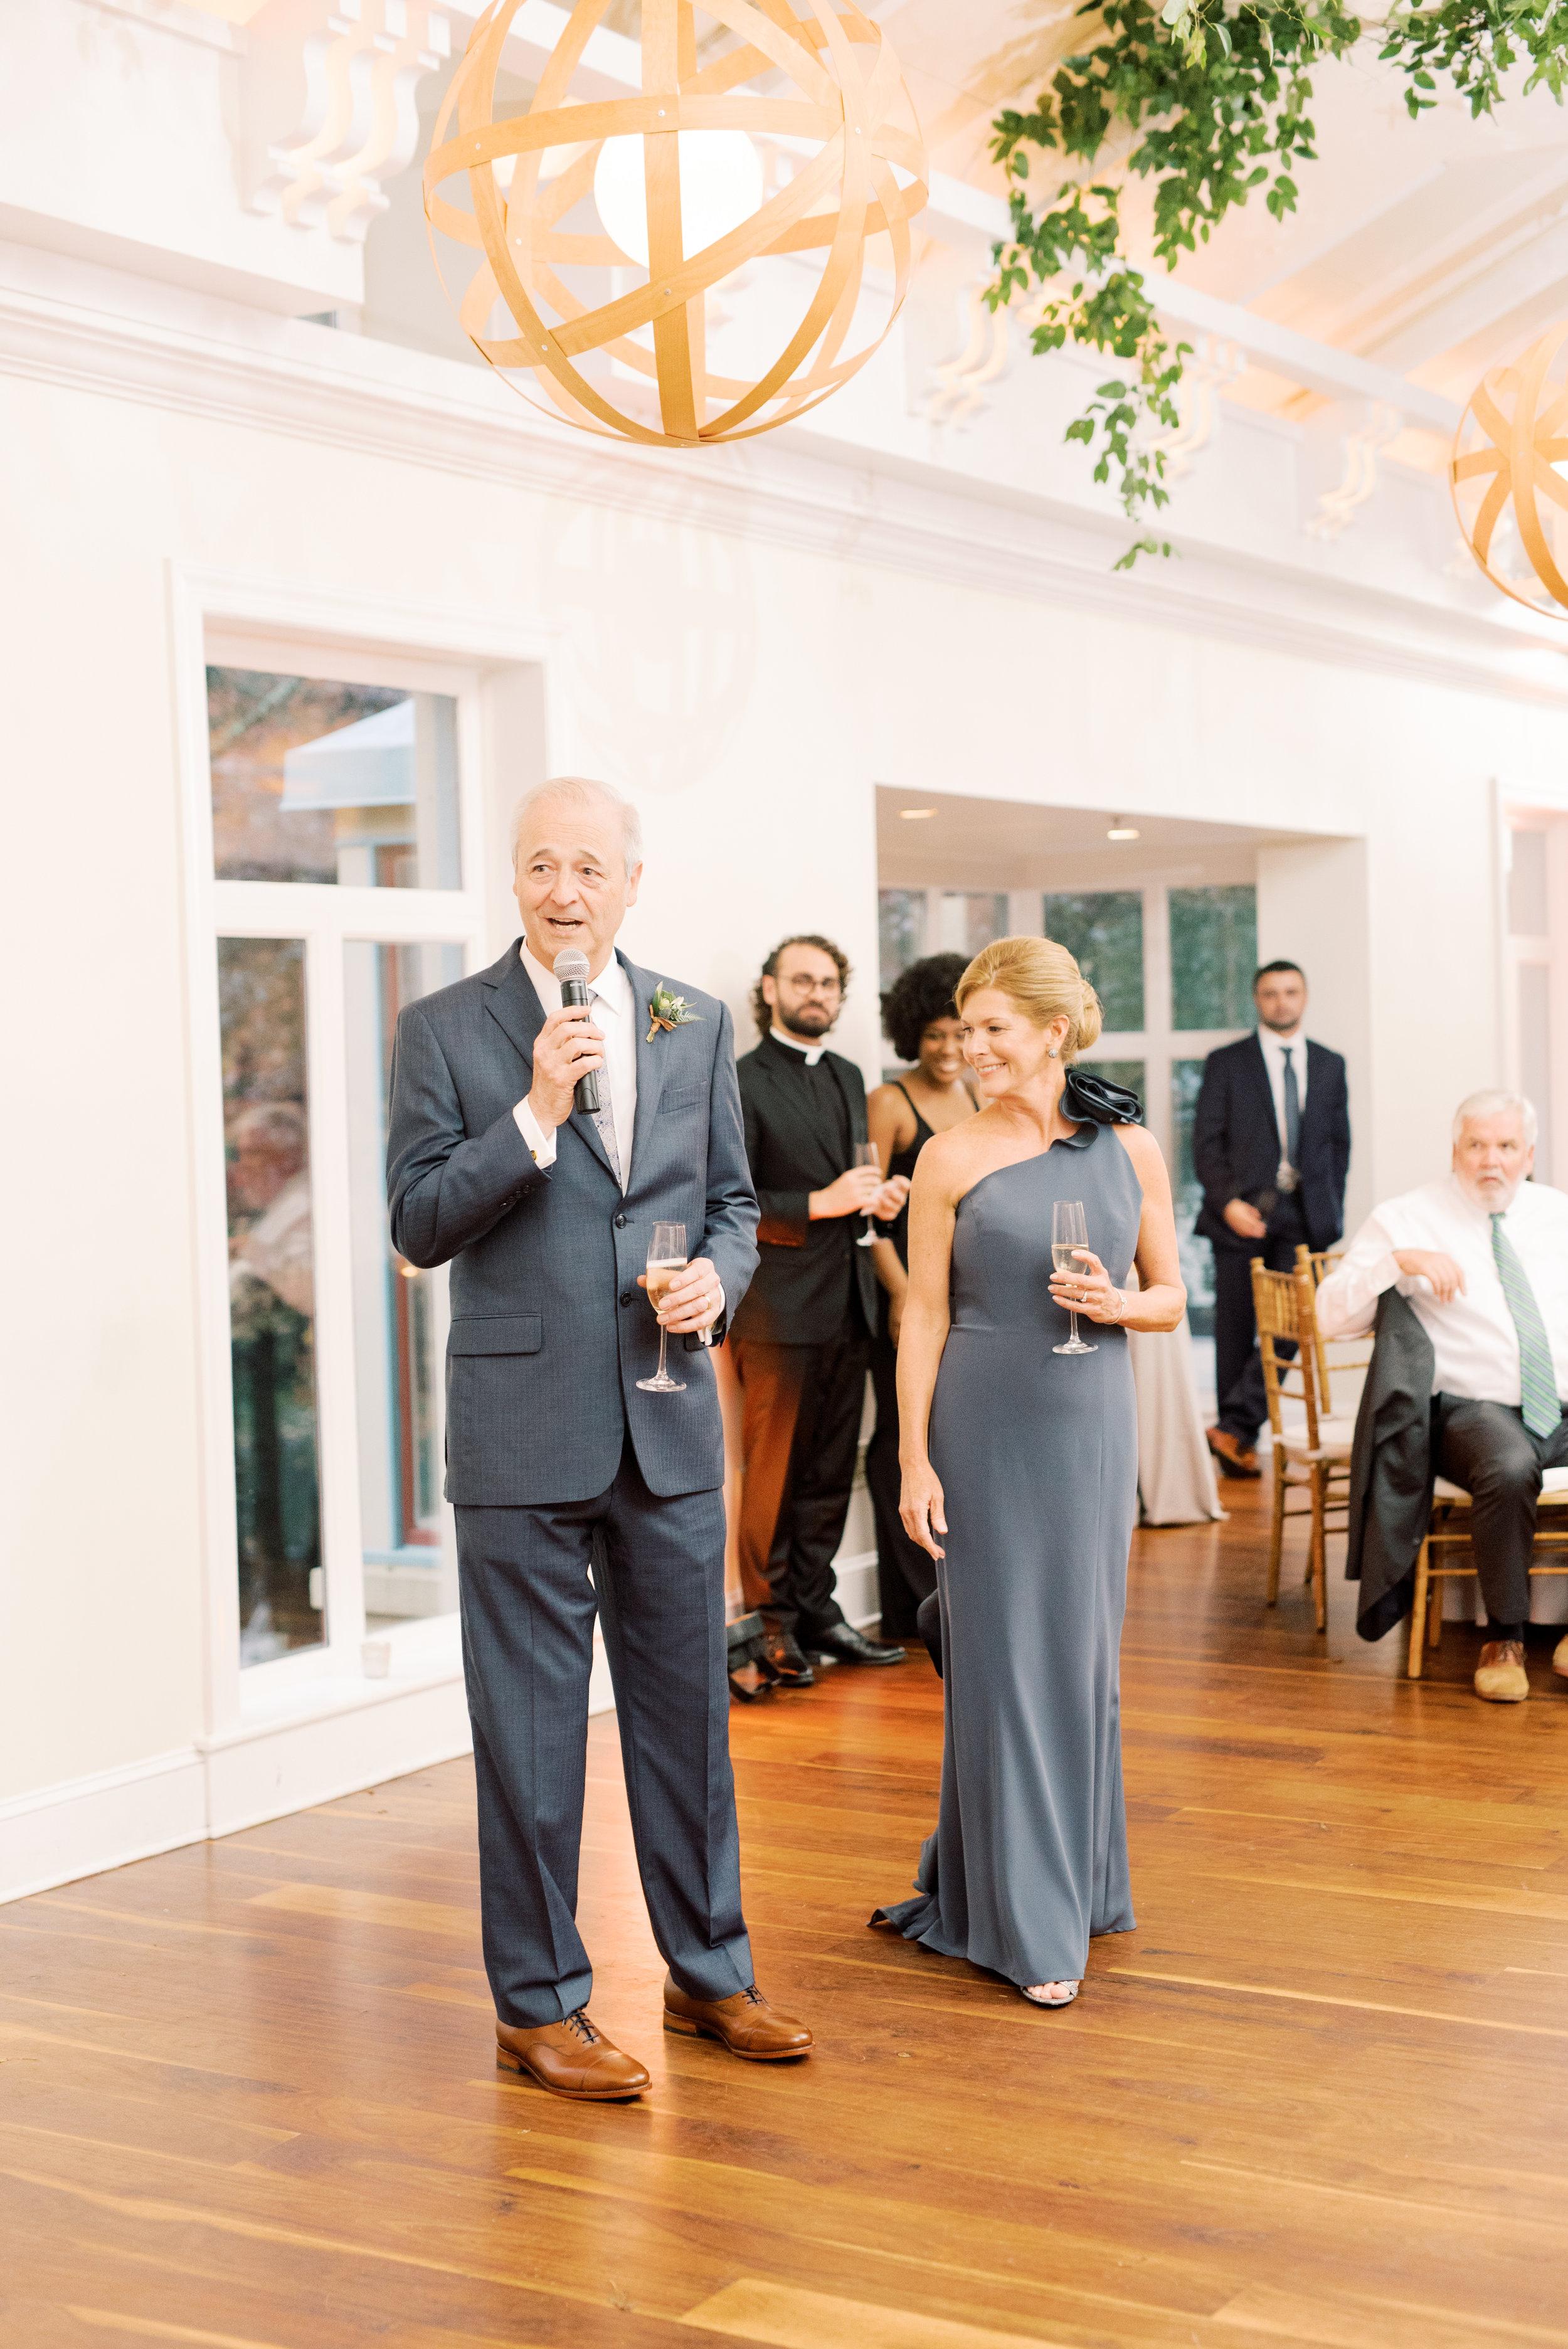 haley-richter-photography-october-pomme-wedding-in-radnor-108.jpg